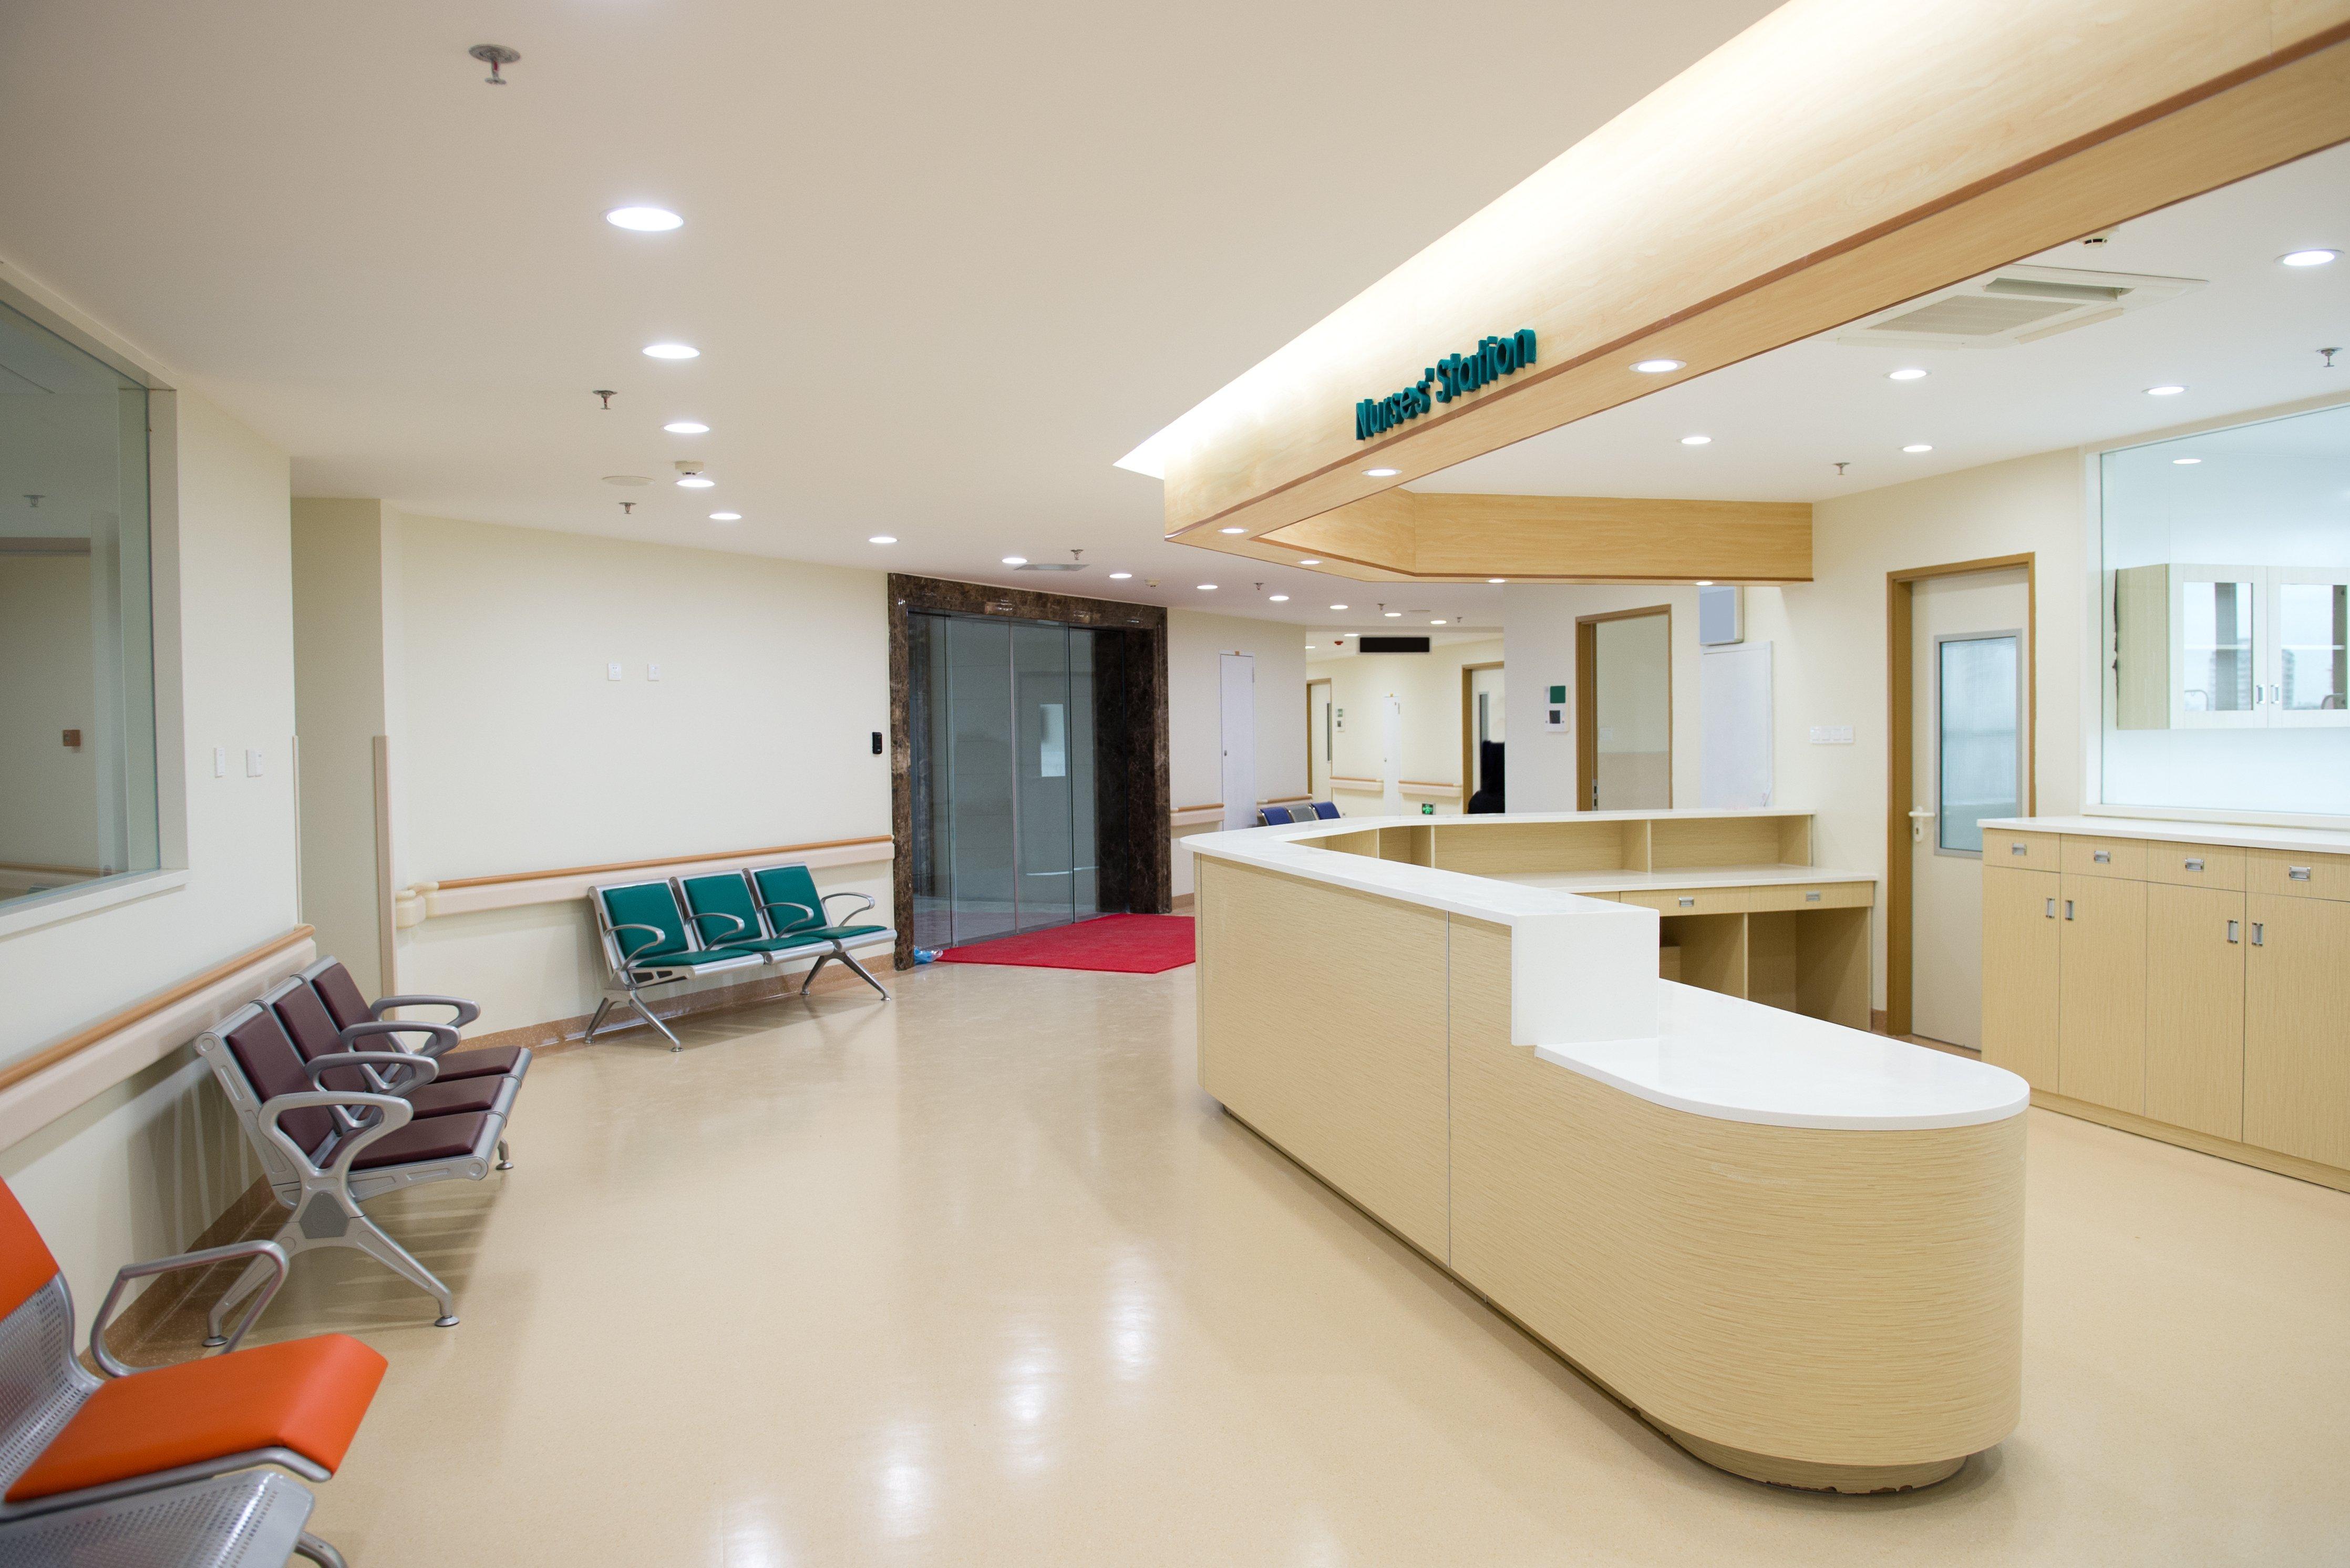 epoxy Hospital grade flooring western sydney